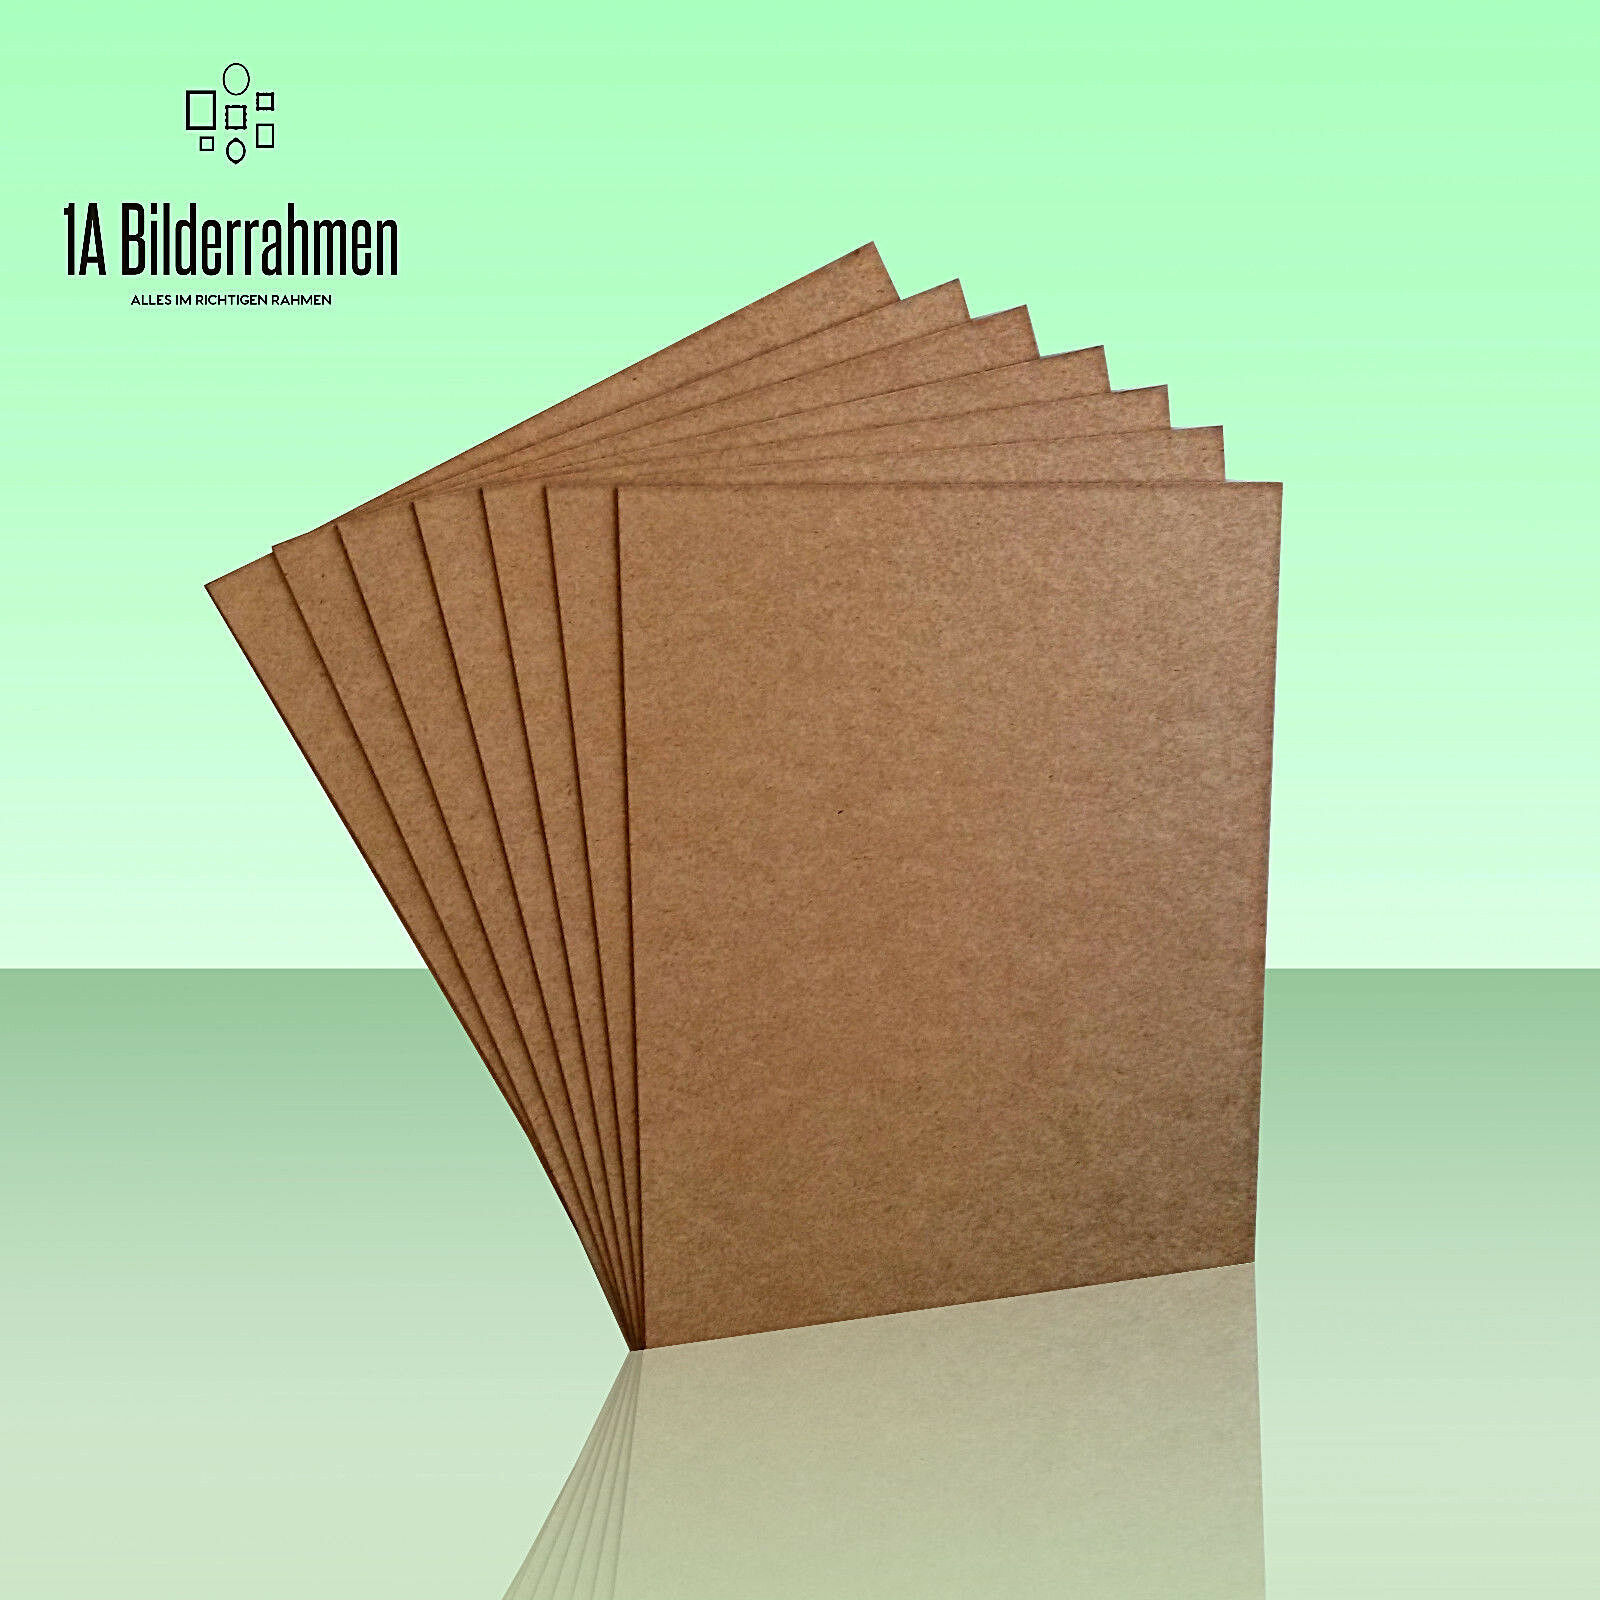 MDF Platten Holzplatten Hartfaserplatten 2,5 mm Stark Wunschgröße Preiswert